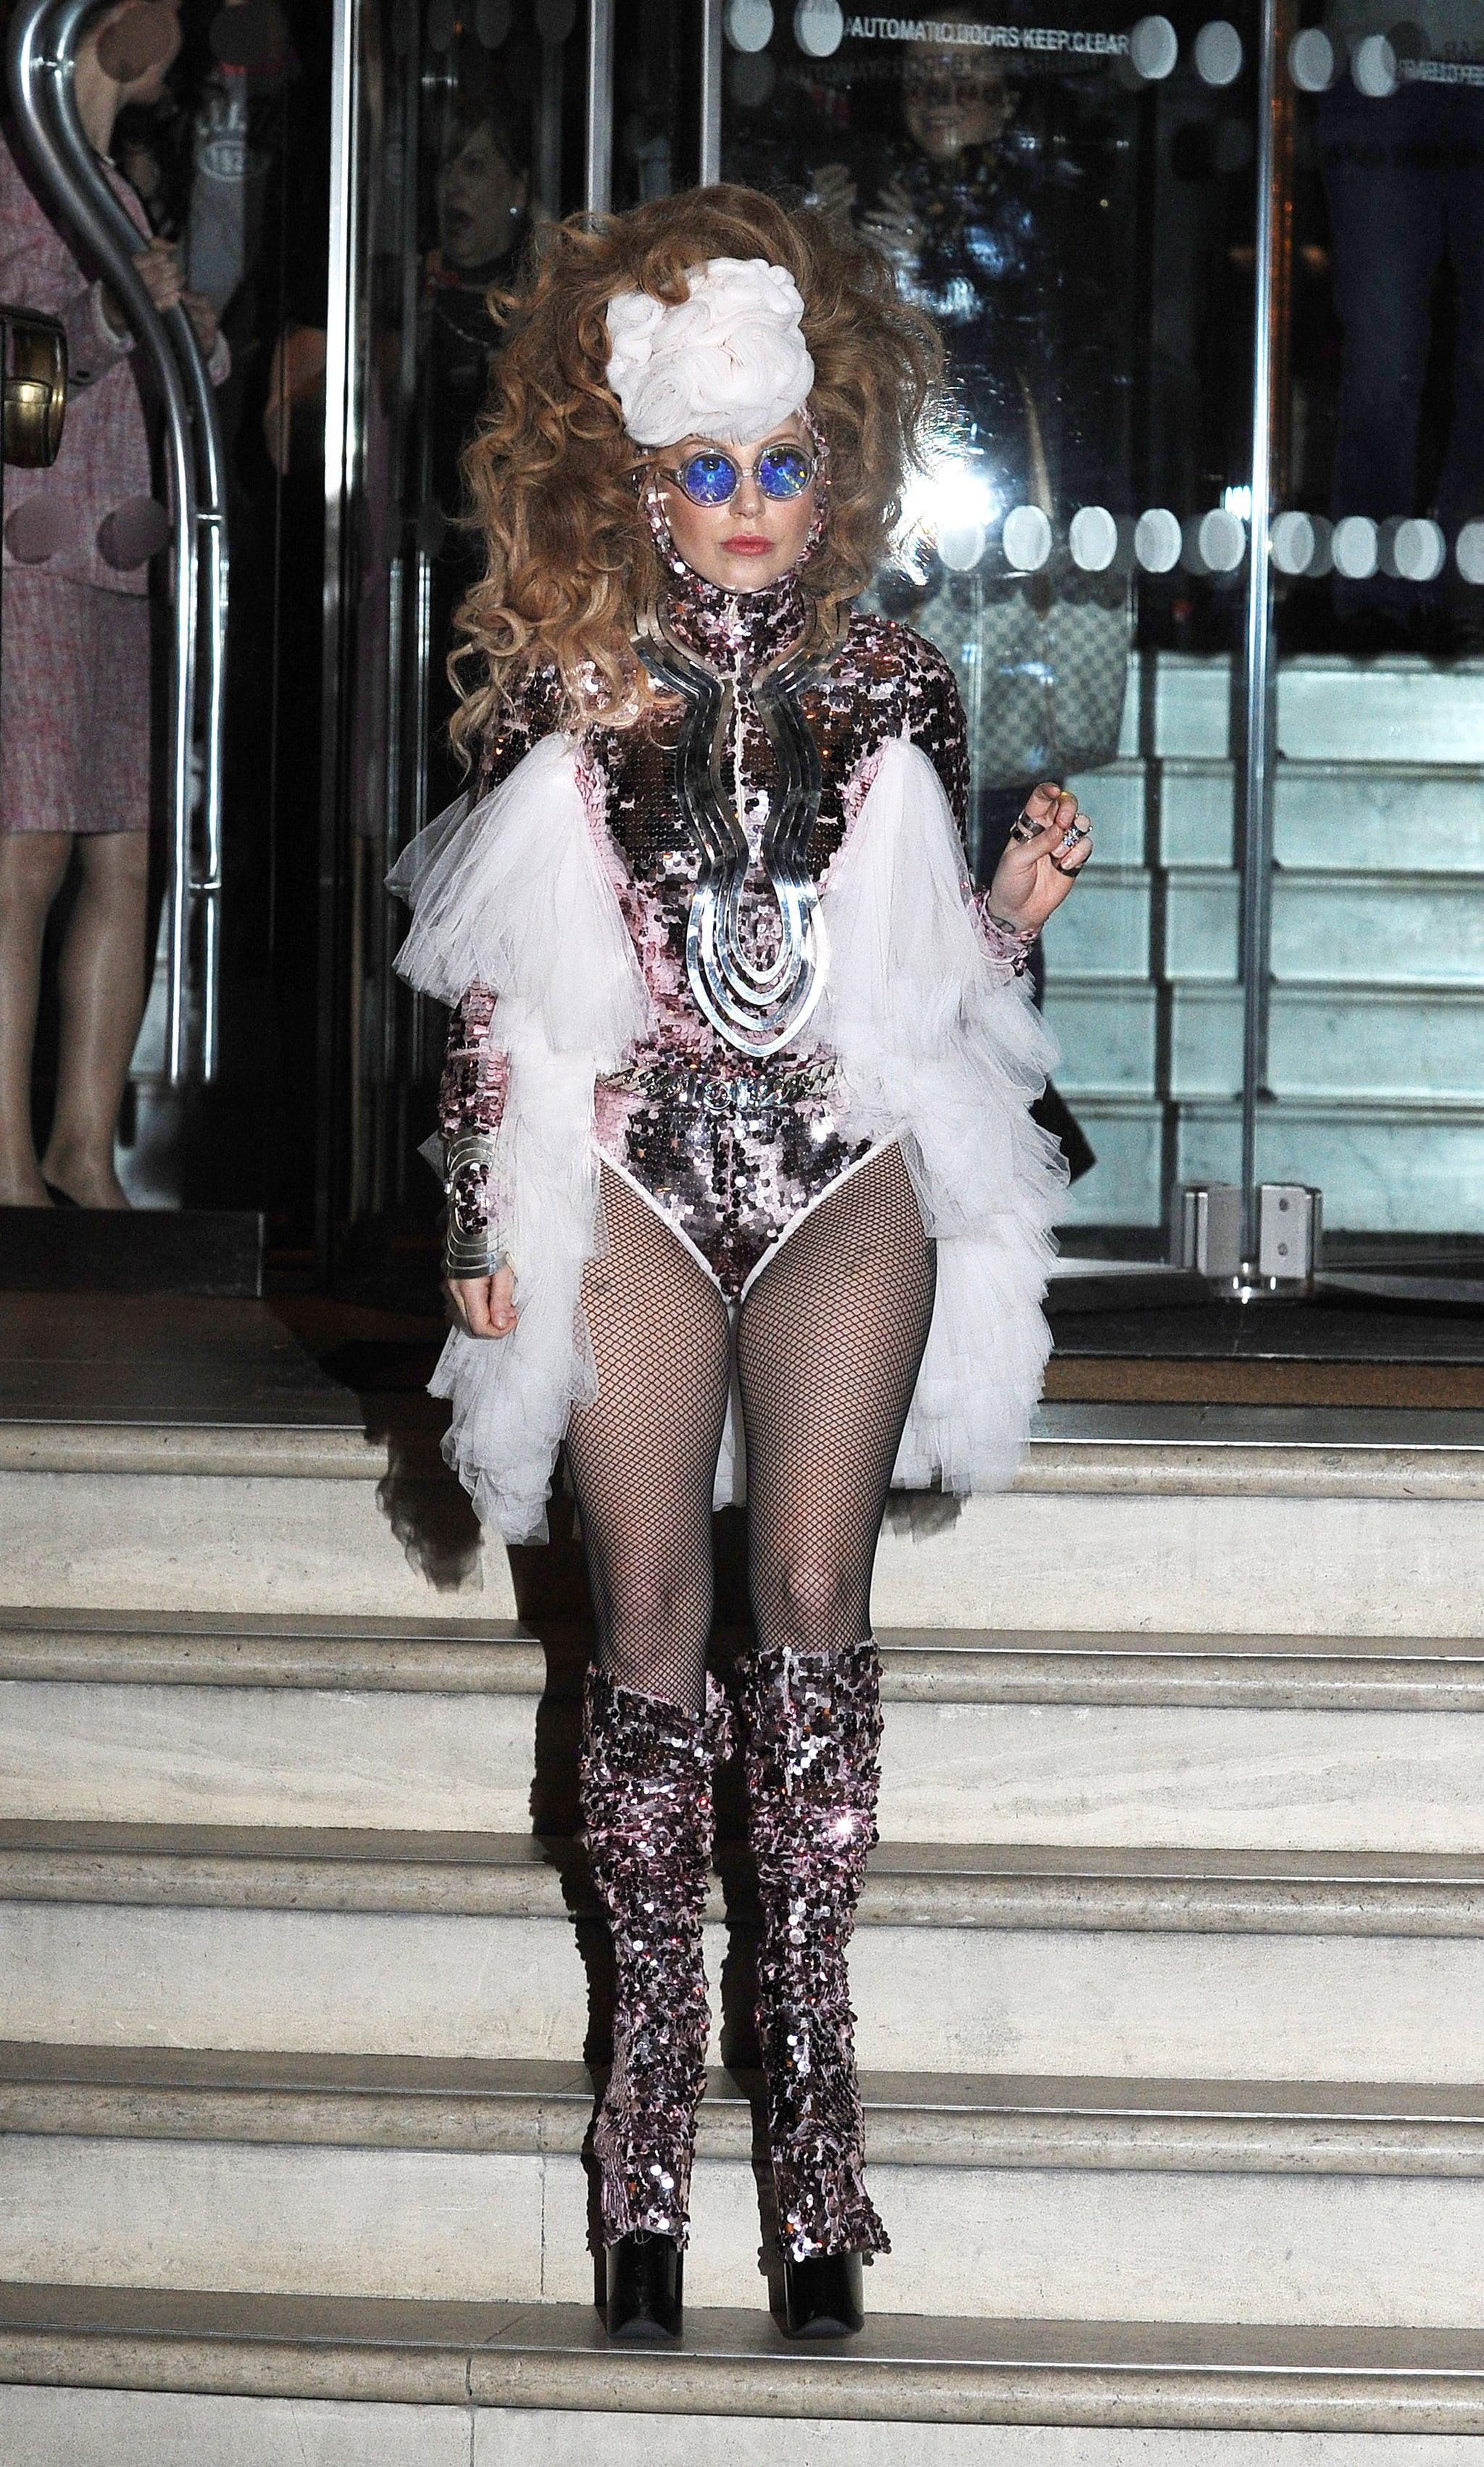 Lady-Gaga-Sequined-Bodysuit-London-2013.